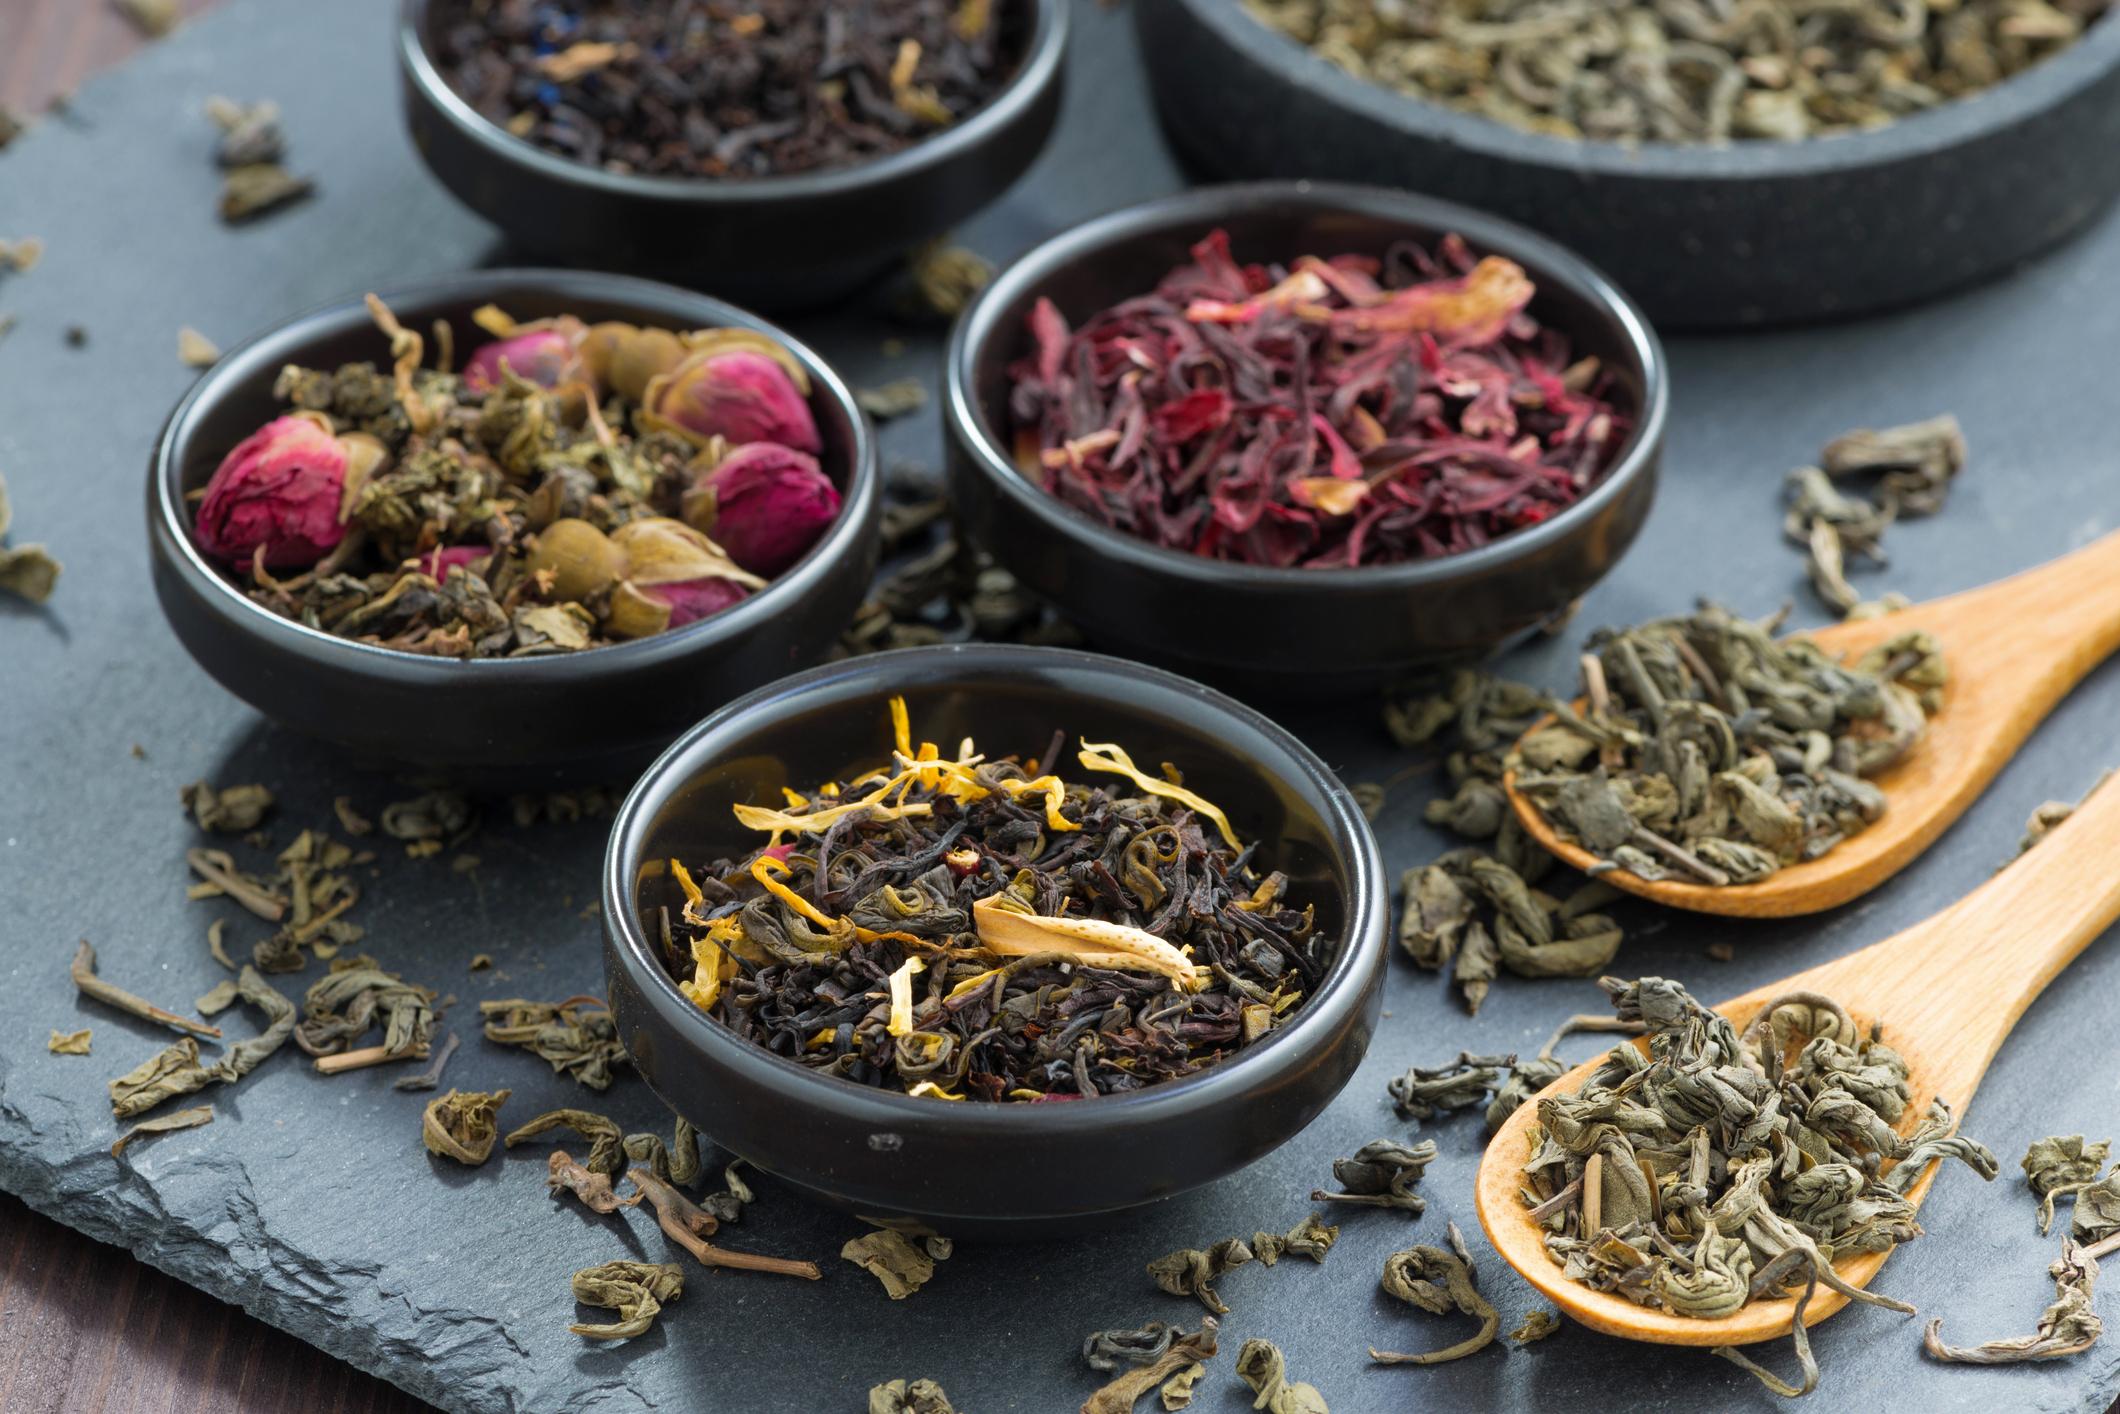 The Jackson Avenue Tea Company